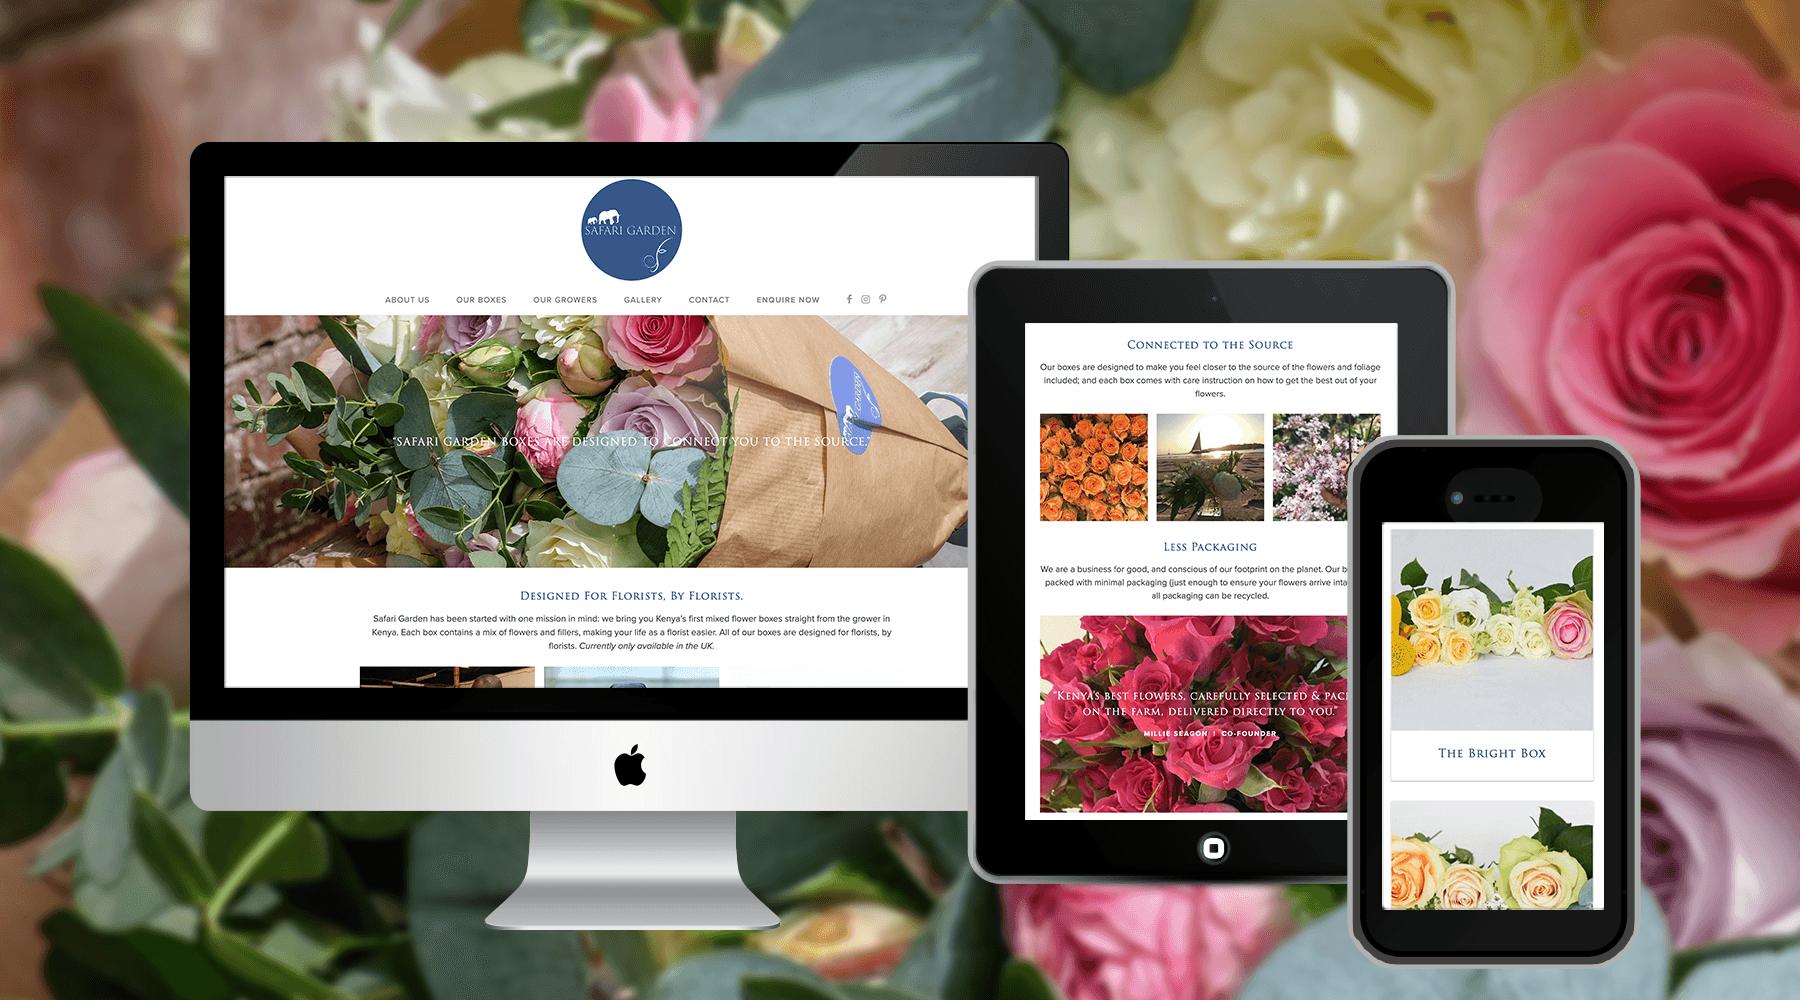 Safari Garden International Flower Distributor